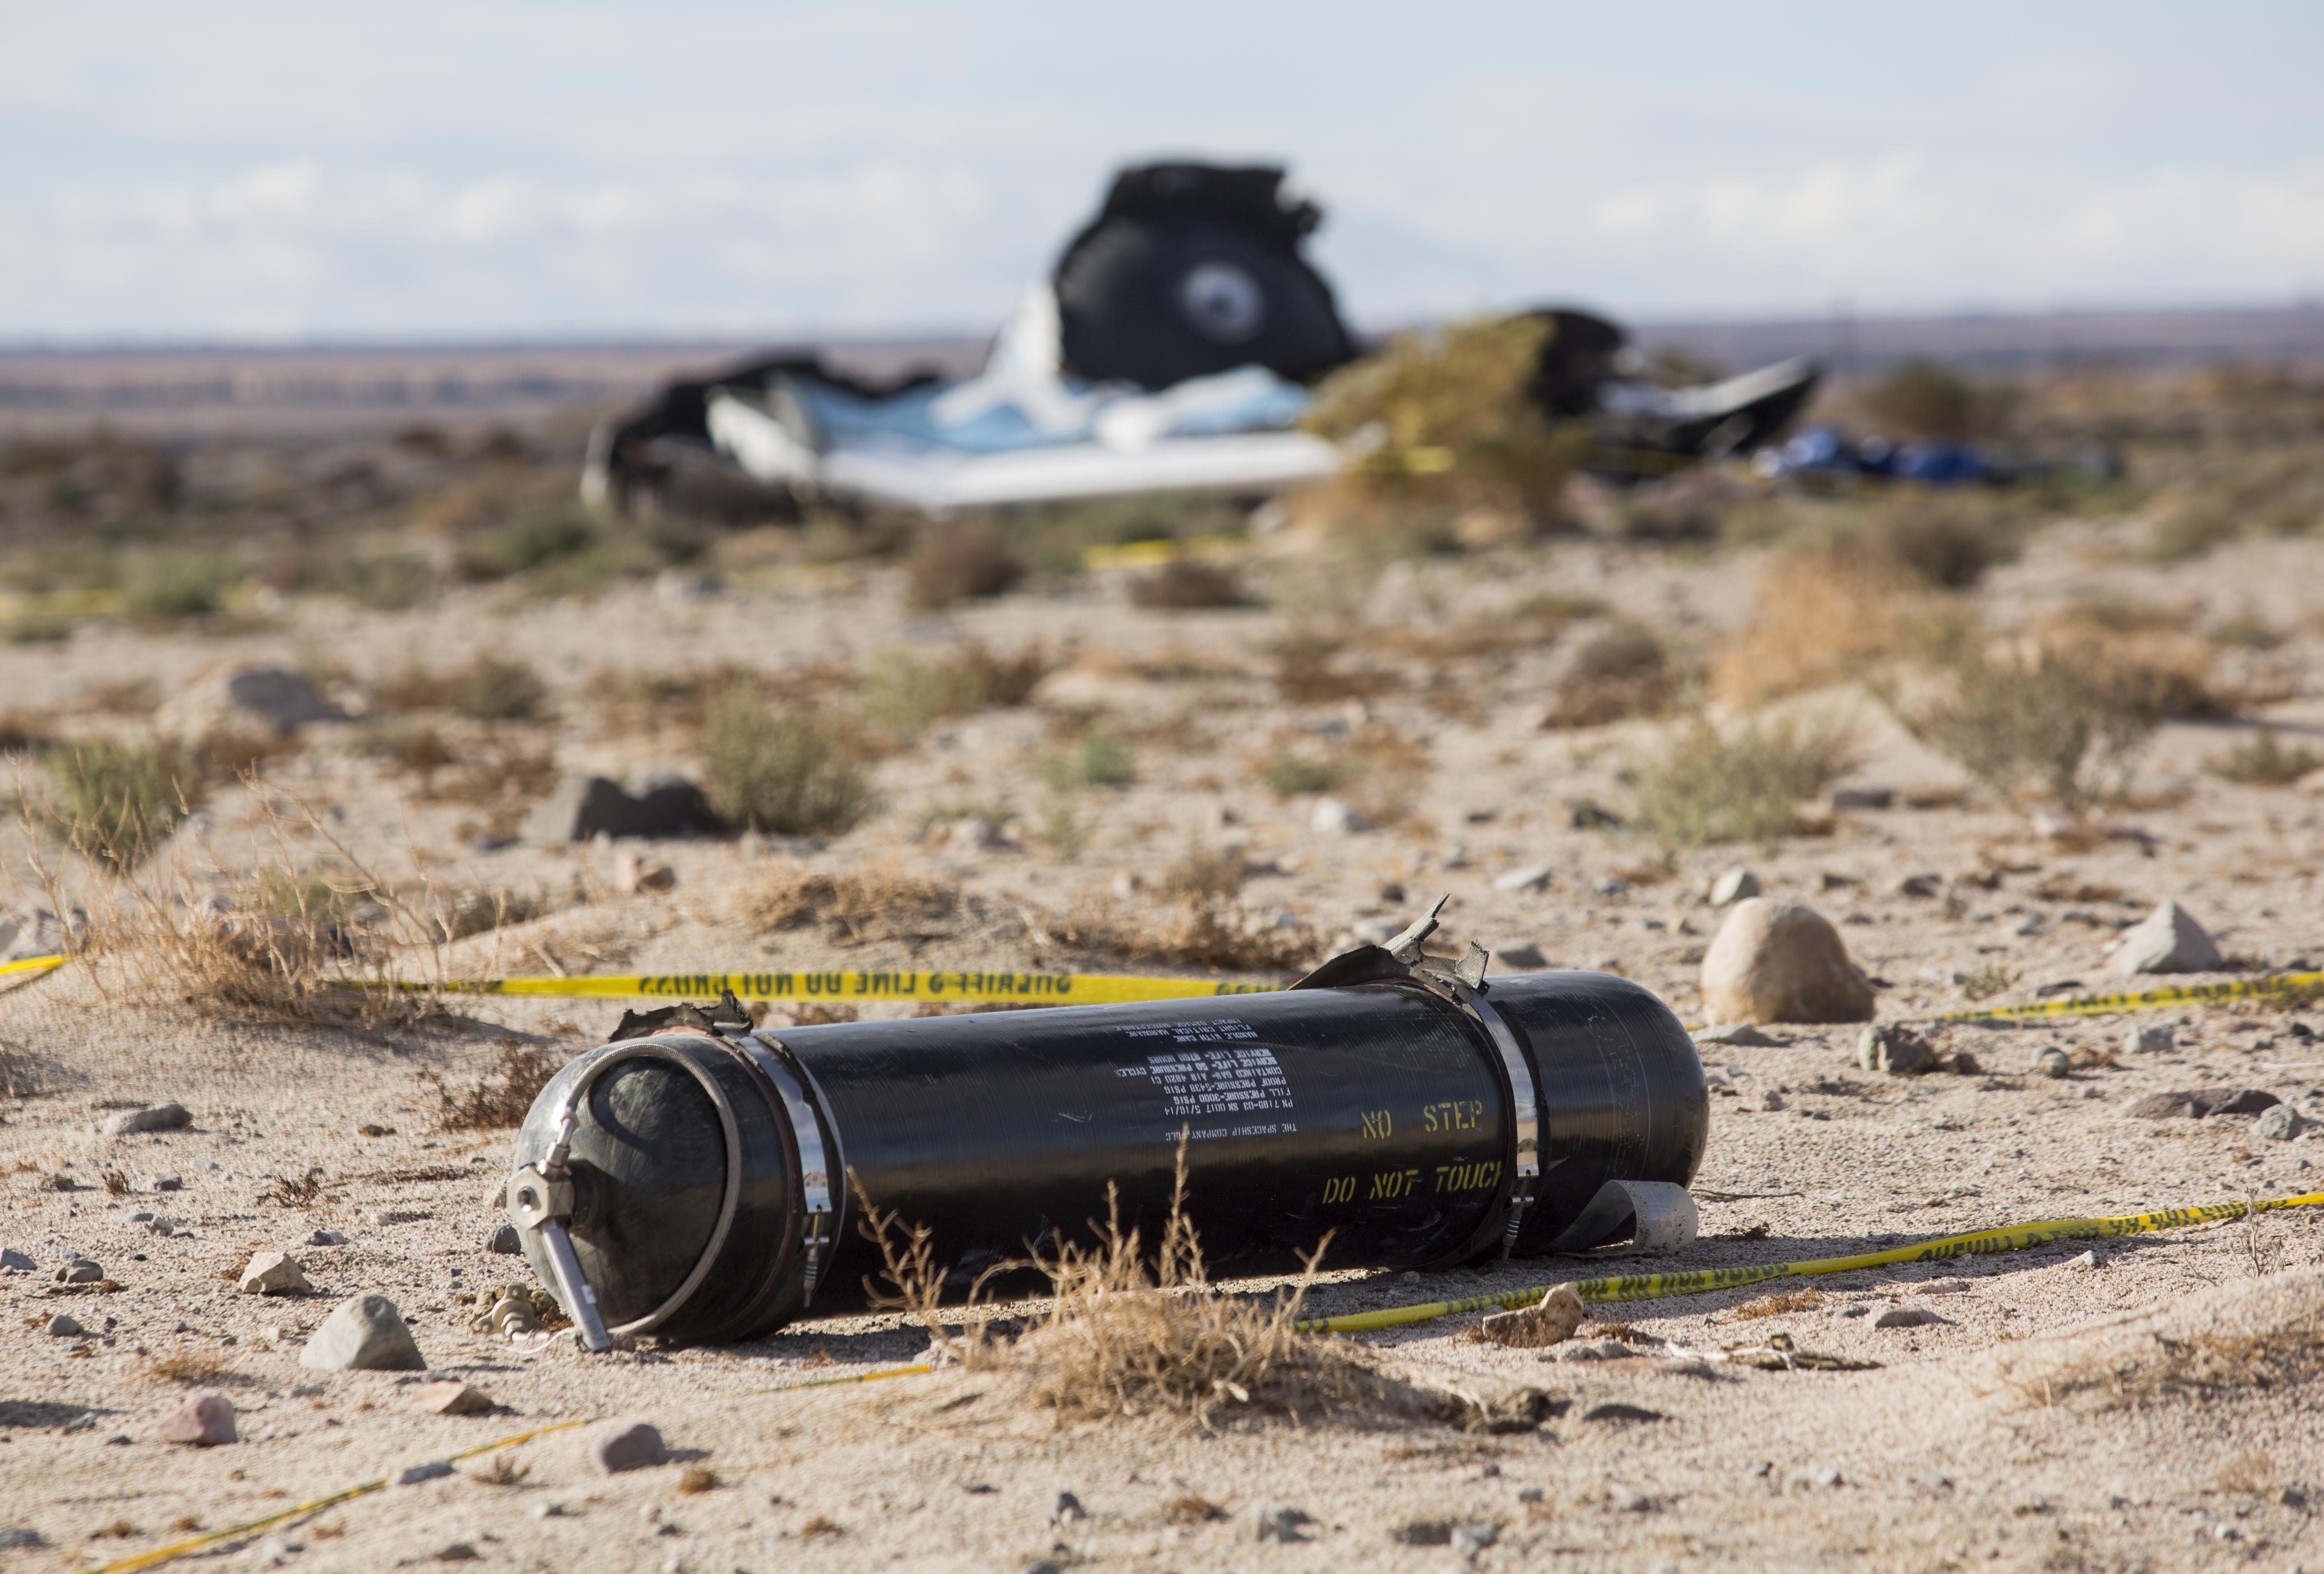 spacecraft crash - photo #20